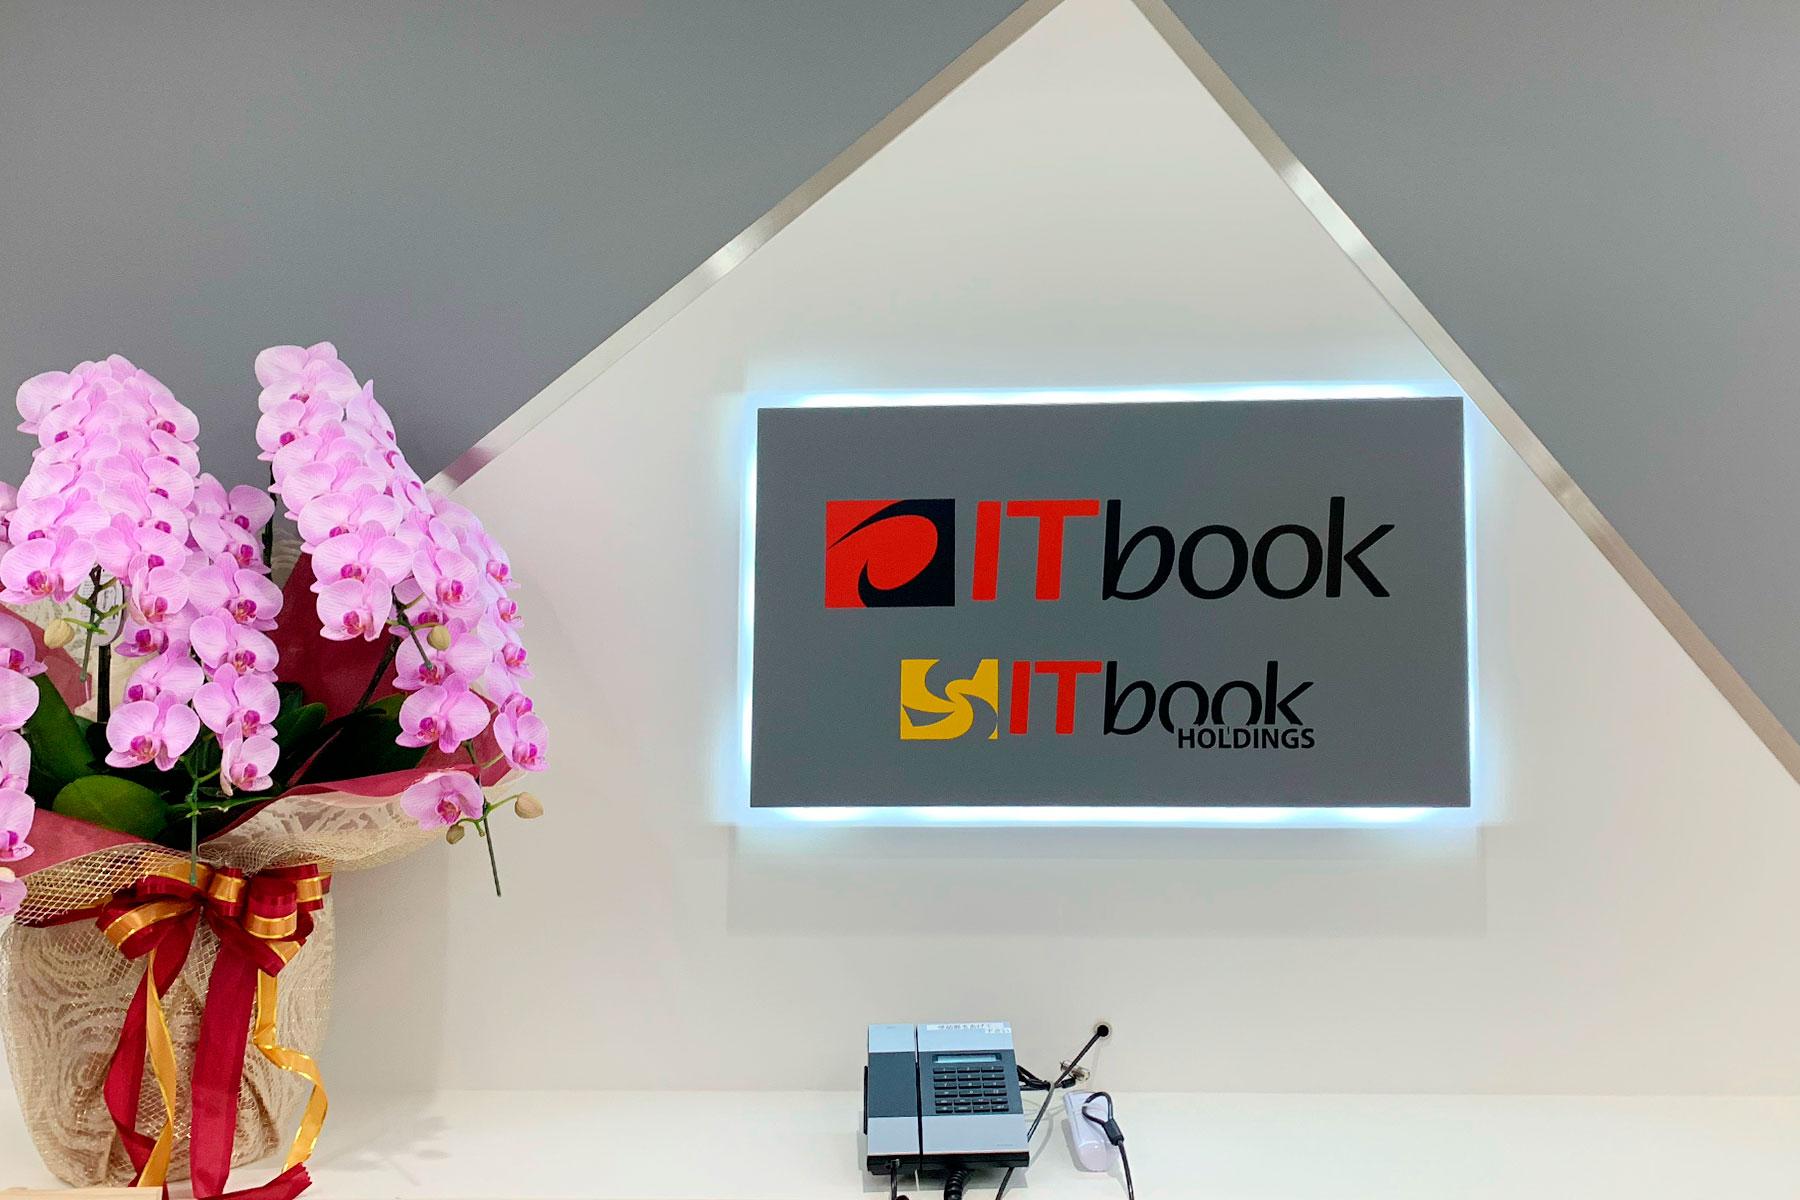 ITbookホールディングス株式会社のトップ画像